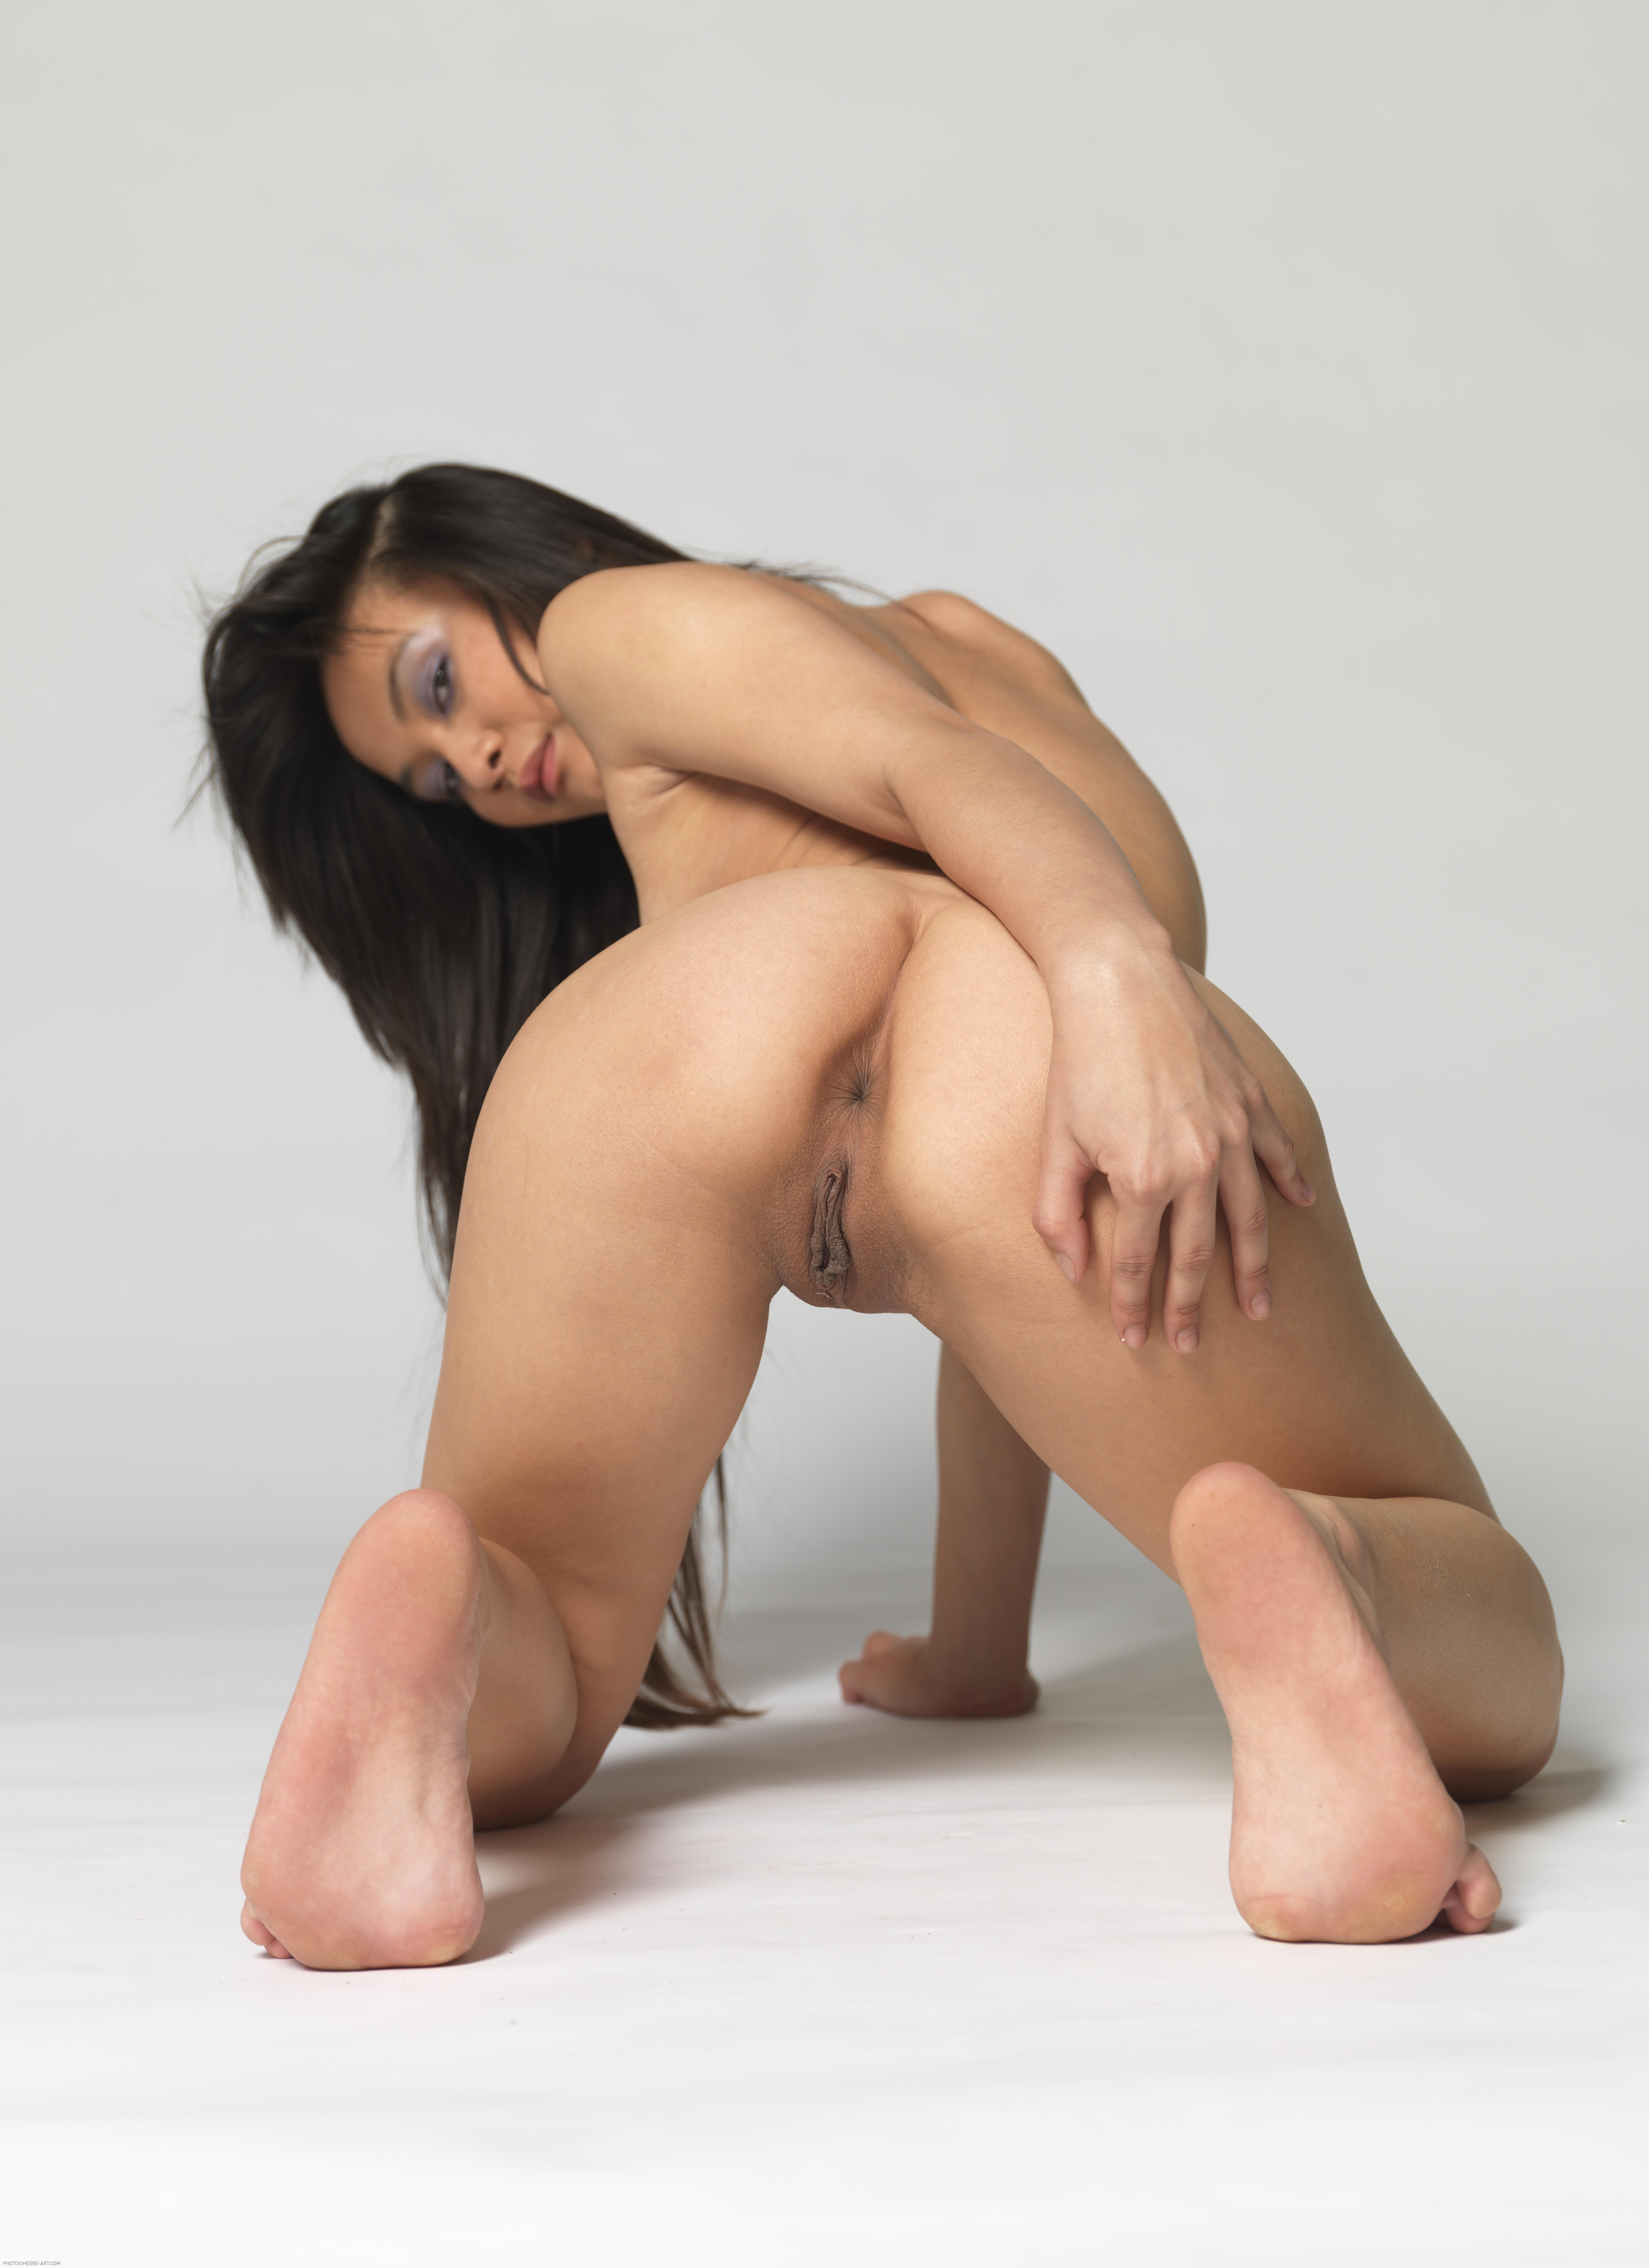 hegre art leona lorenzo porn